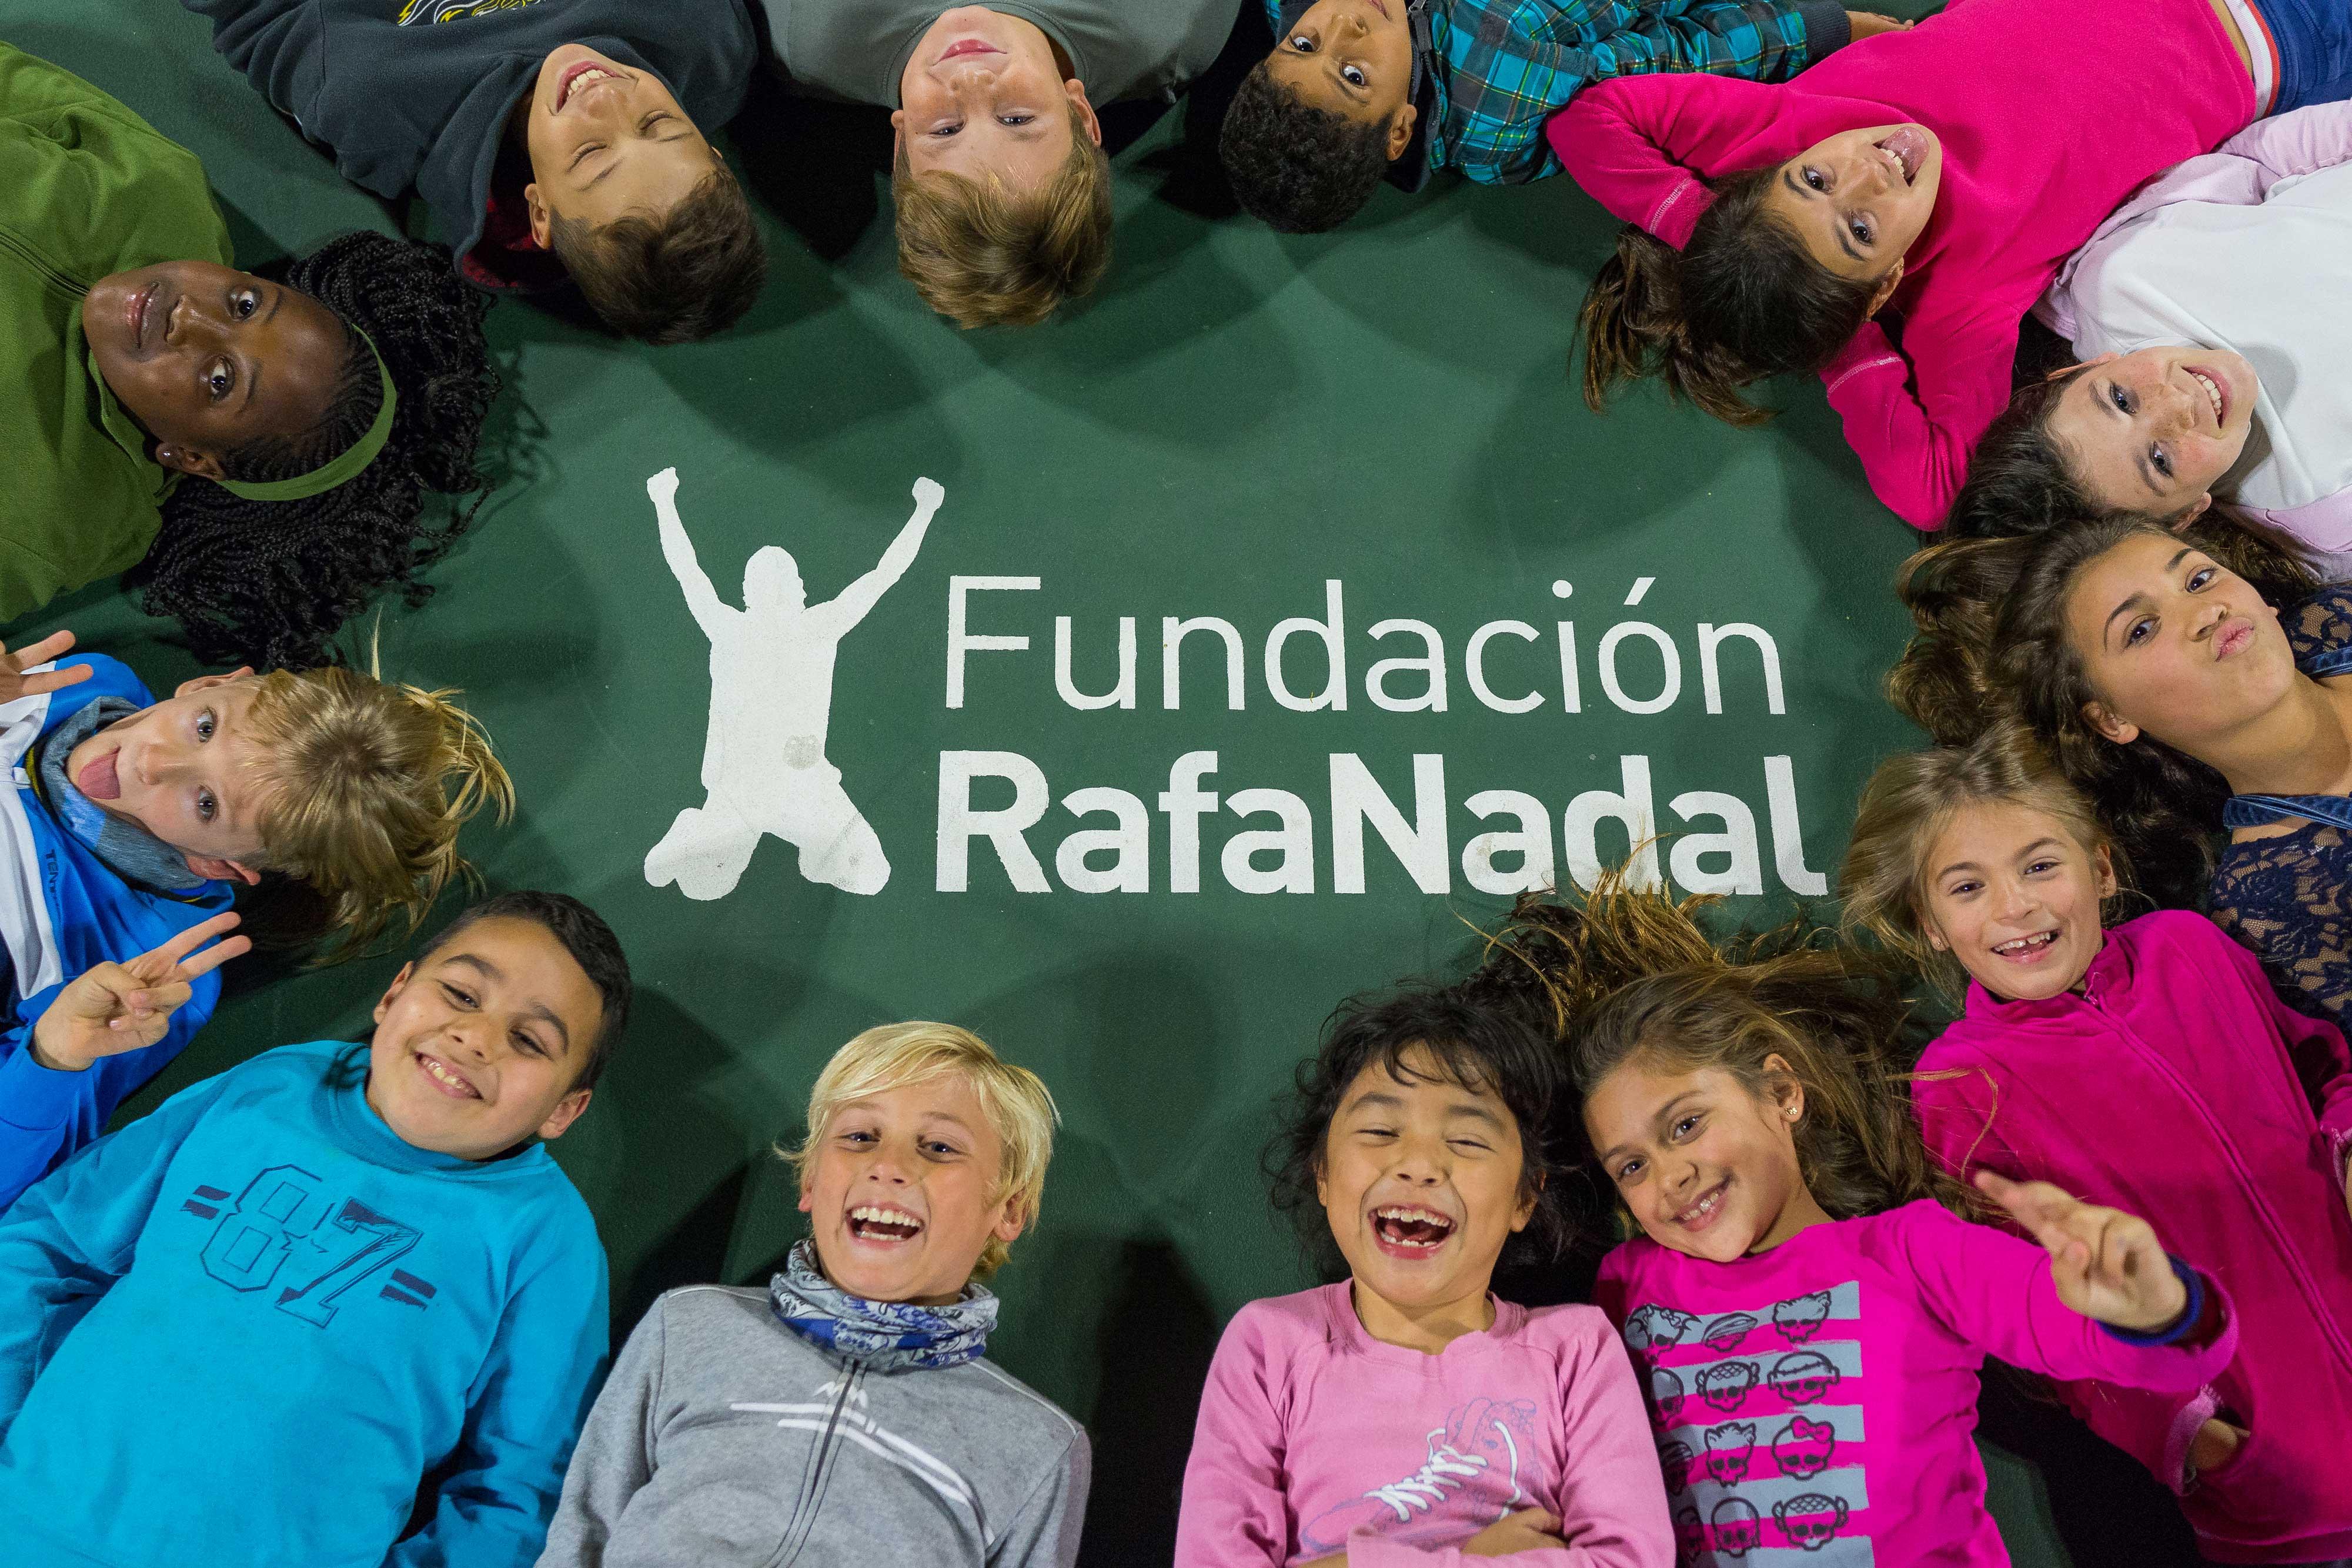 Fundación-Rafa-Nadal